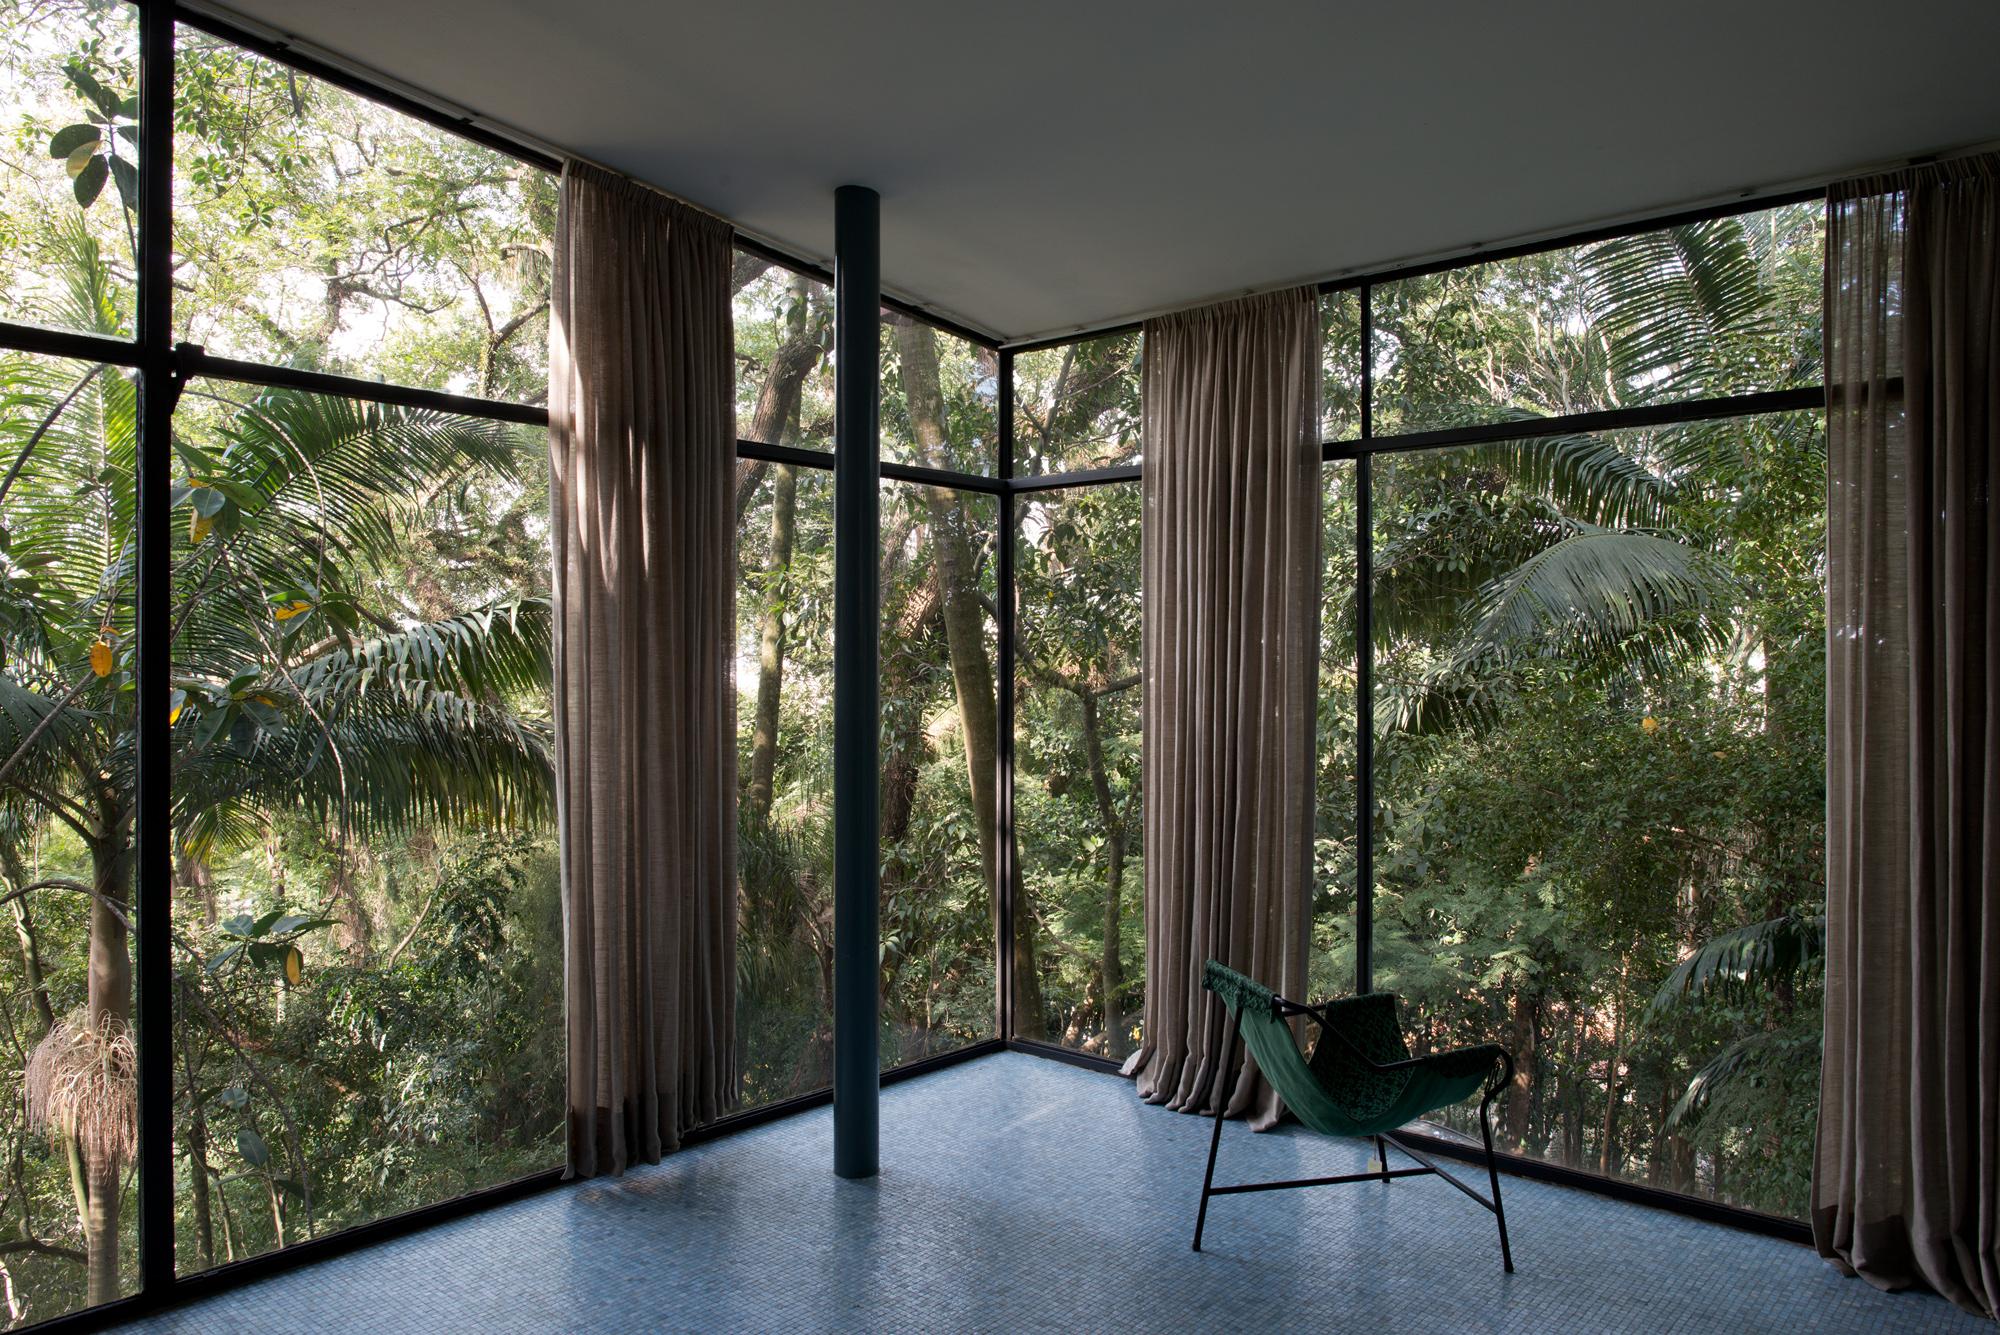 Casa de Vidro, São Paulo, 1949-1951, fot.Markus Lanz, 2014